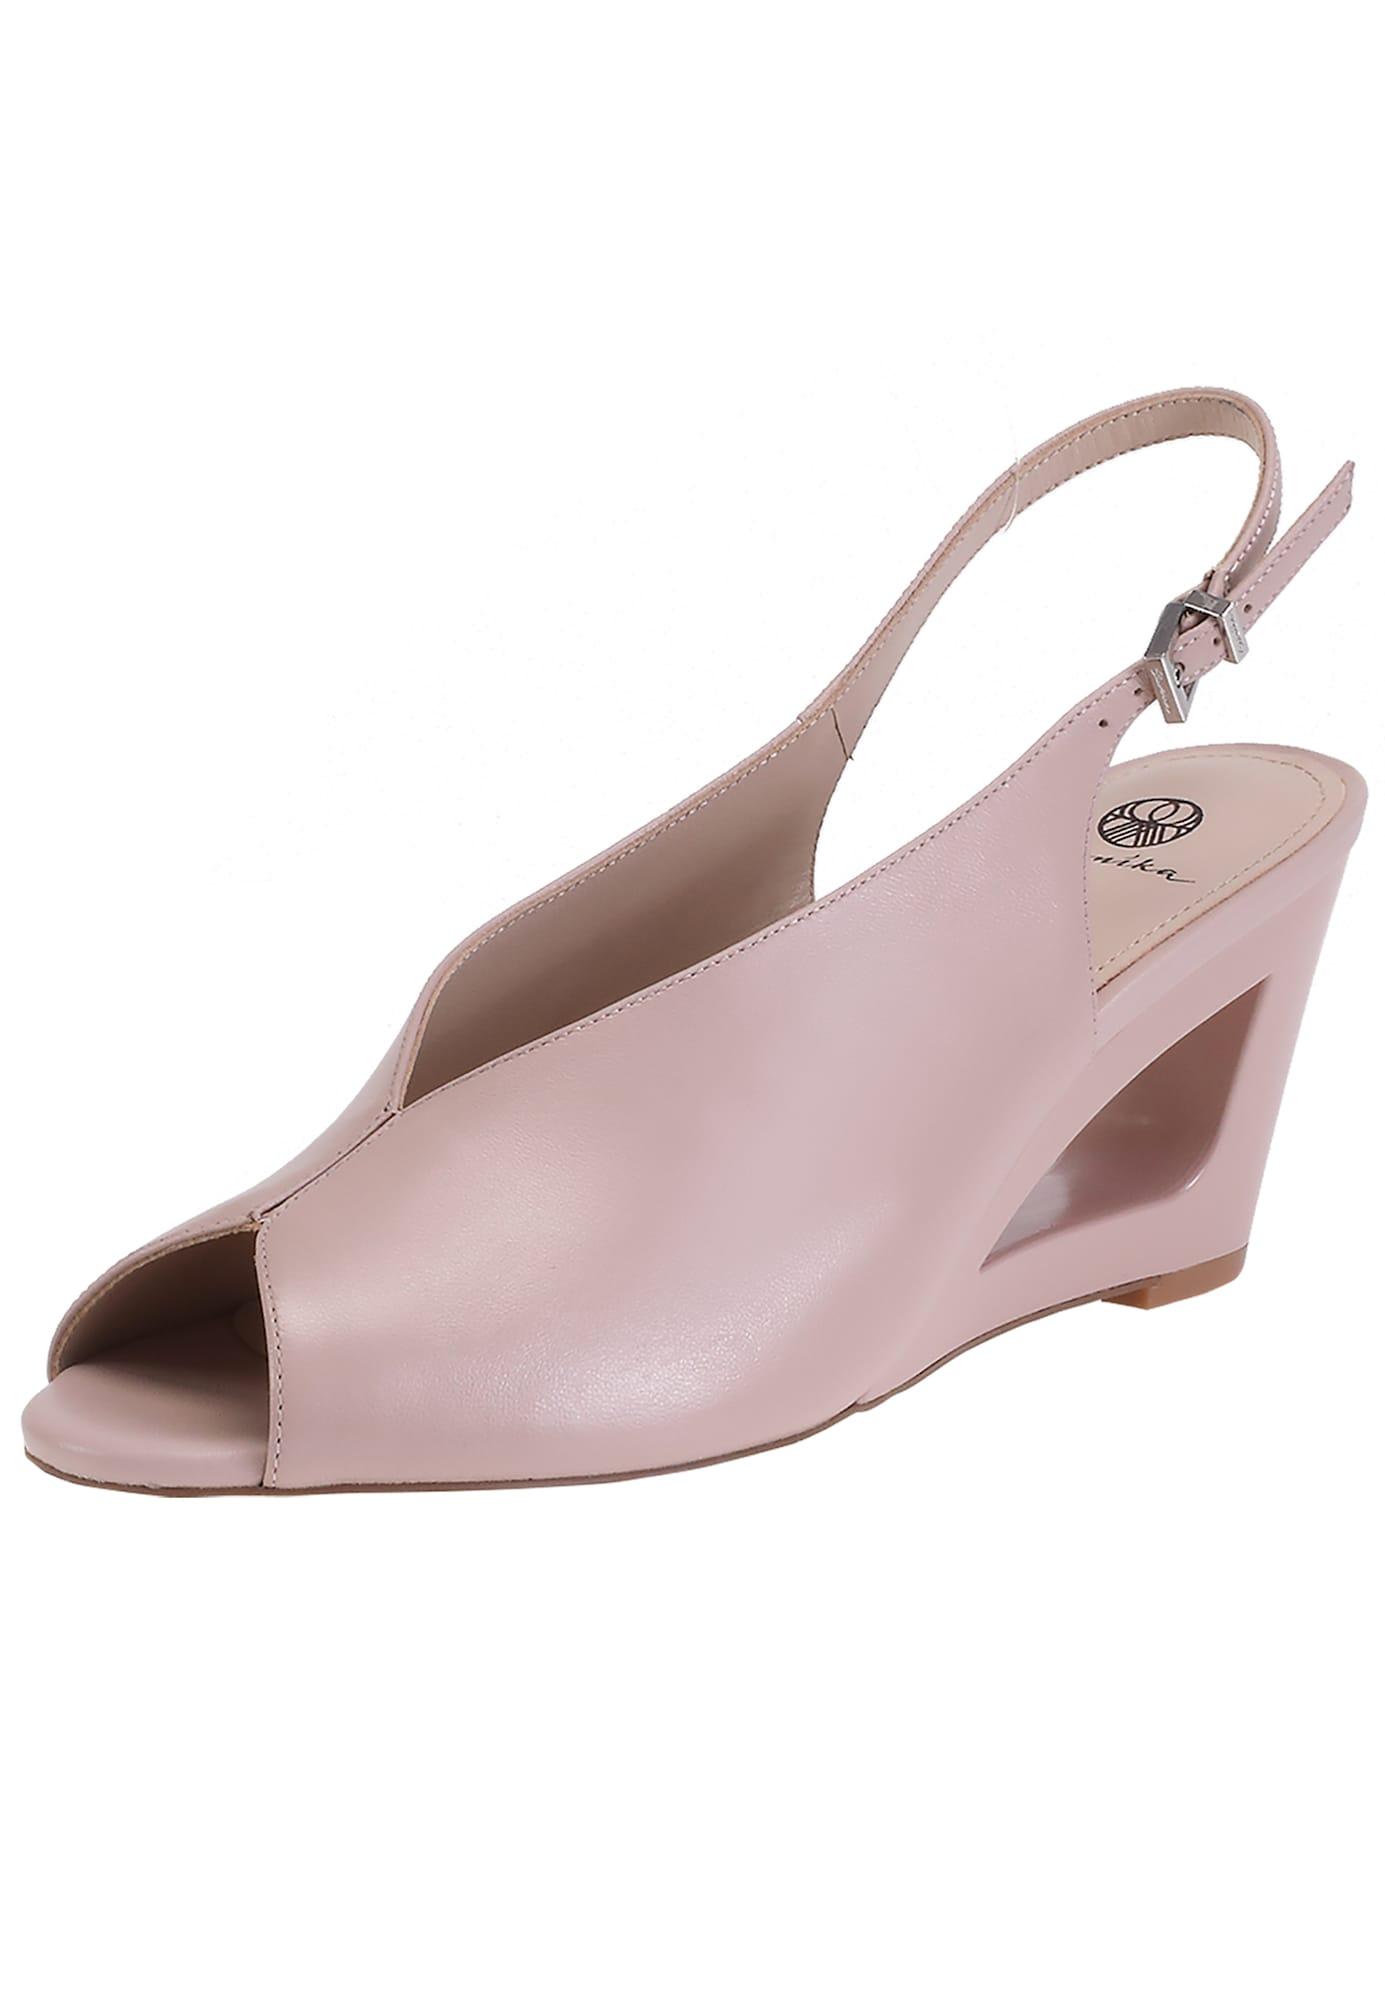 Peeptoes aus glattem Leder | Schuhe > Pumps > Peeptoes | Ekonika